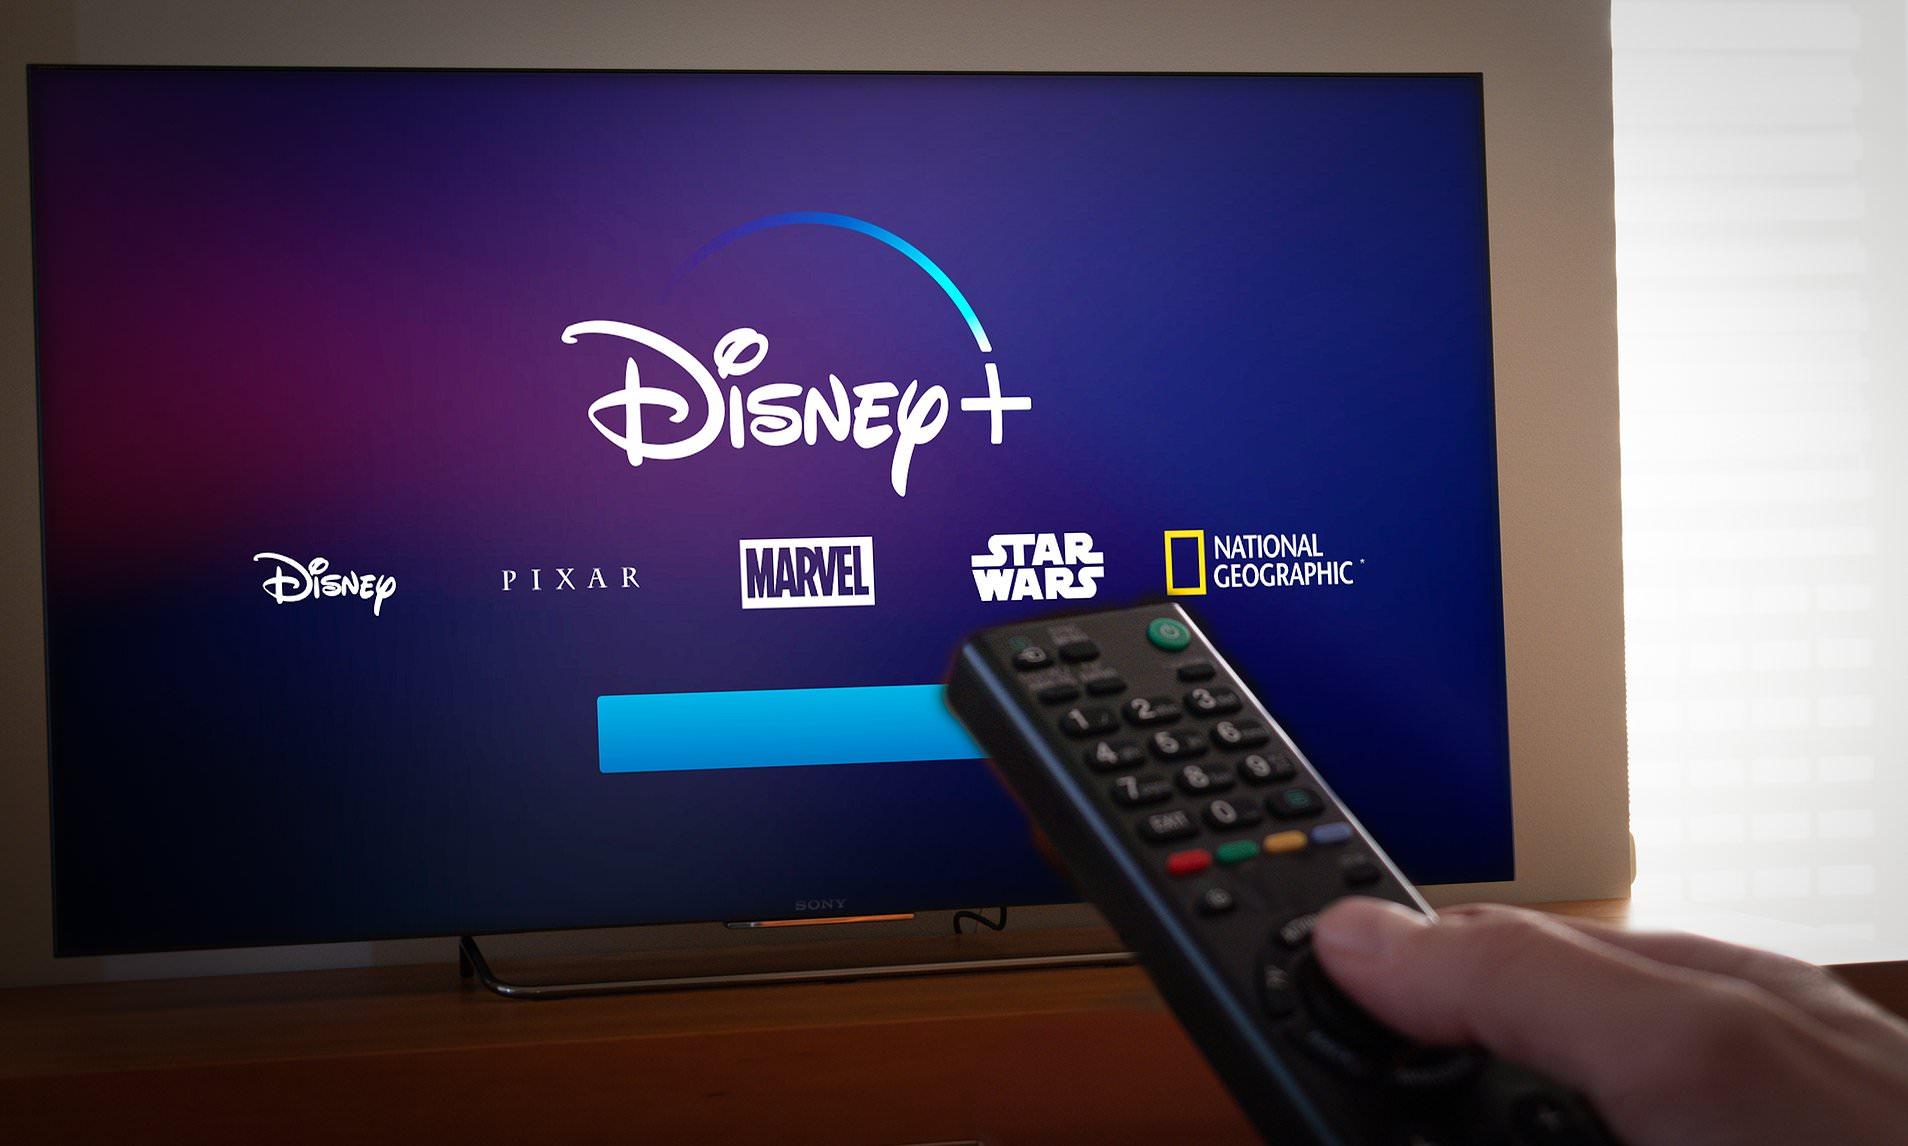 Disney Plus on Samsung TV